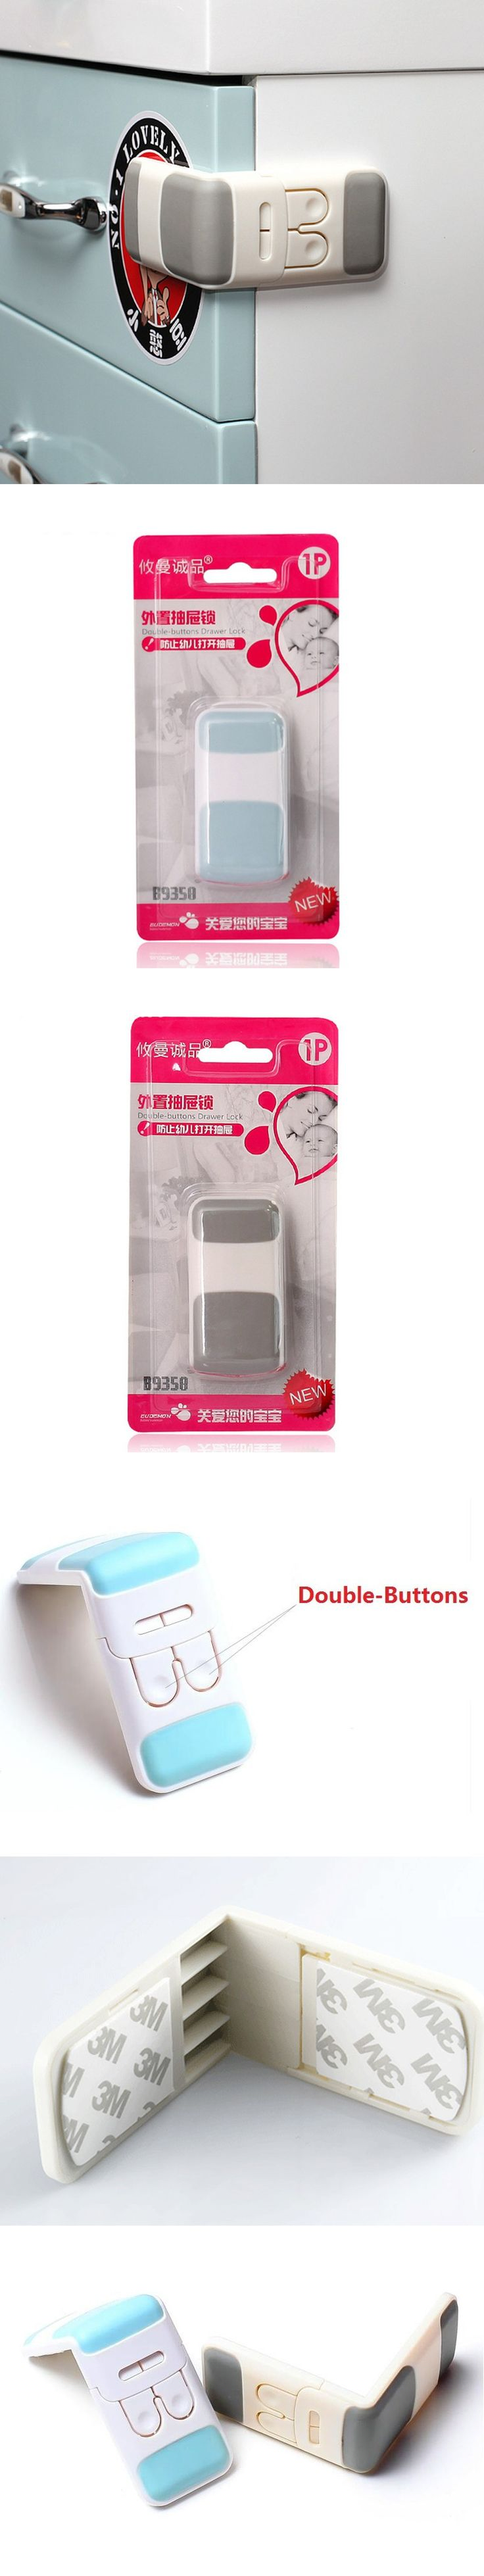 Baby Safety Double-Buttons Drawer Lock Child Cabinet Locks Drawer Refrigerator Locks Seguridad Infantil Kids Safety aTRQ0476